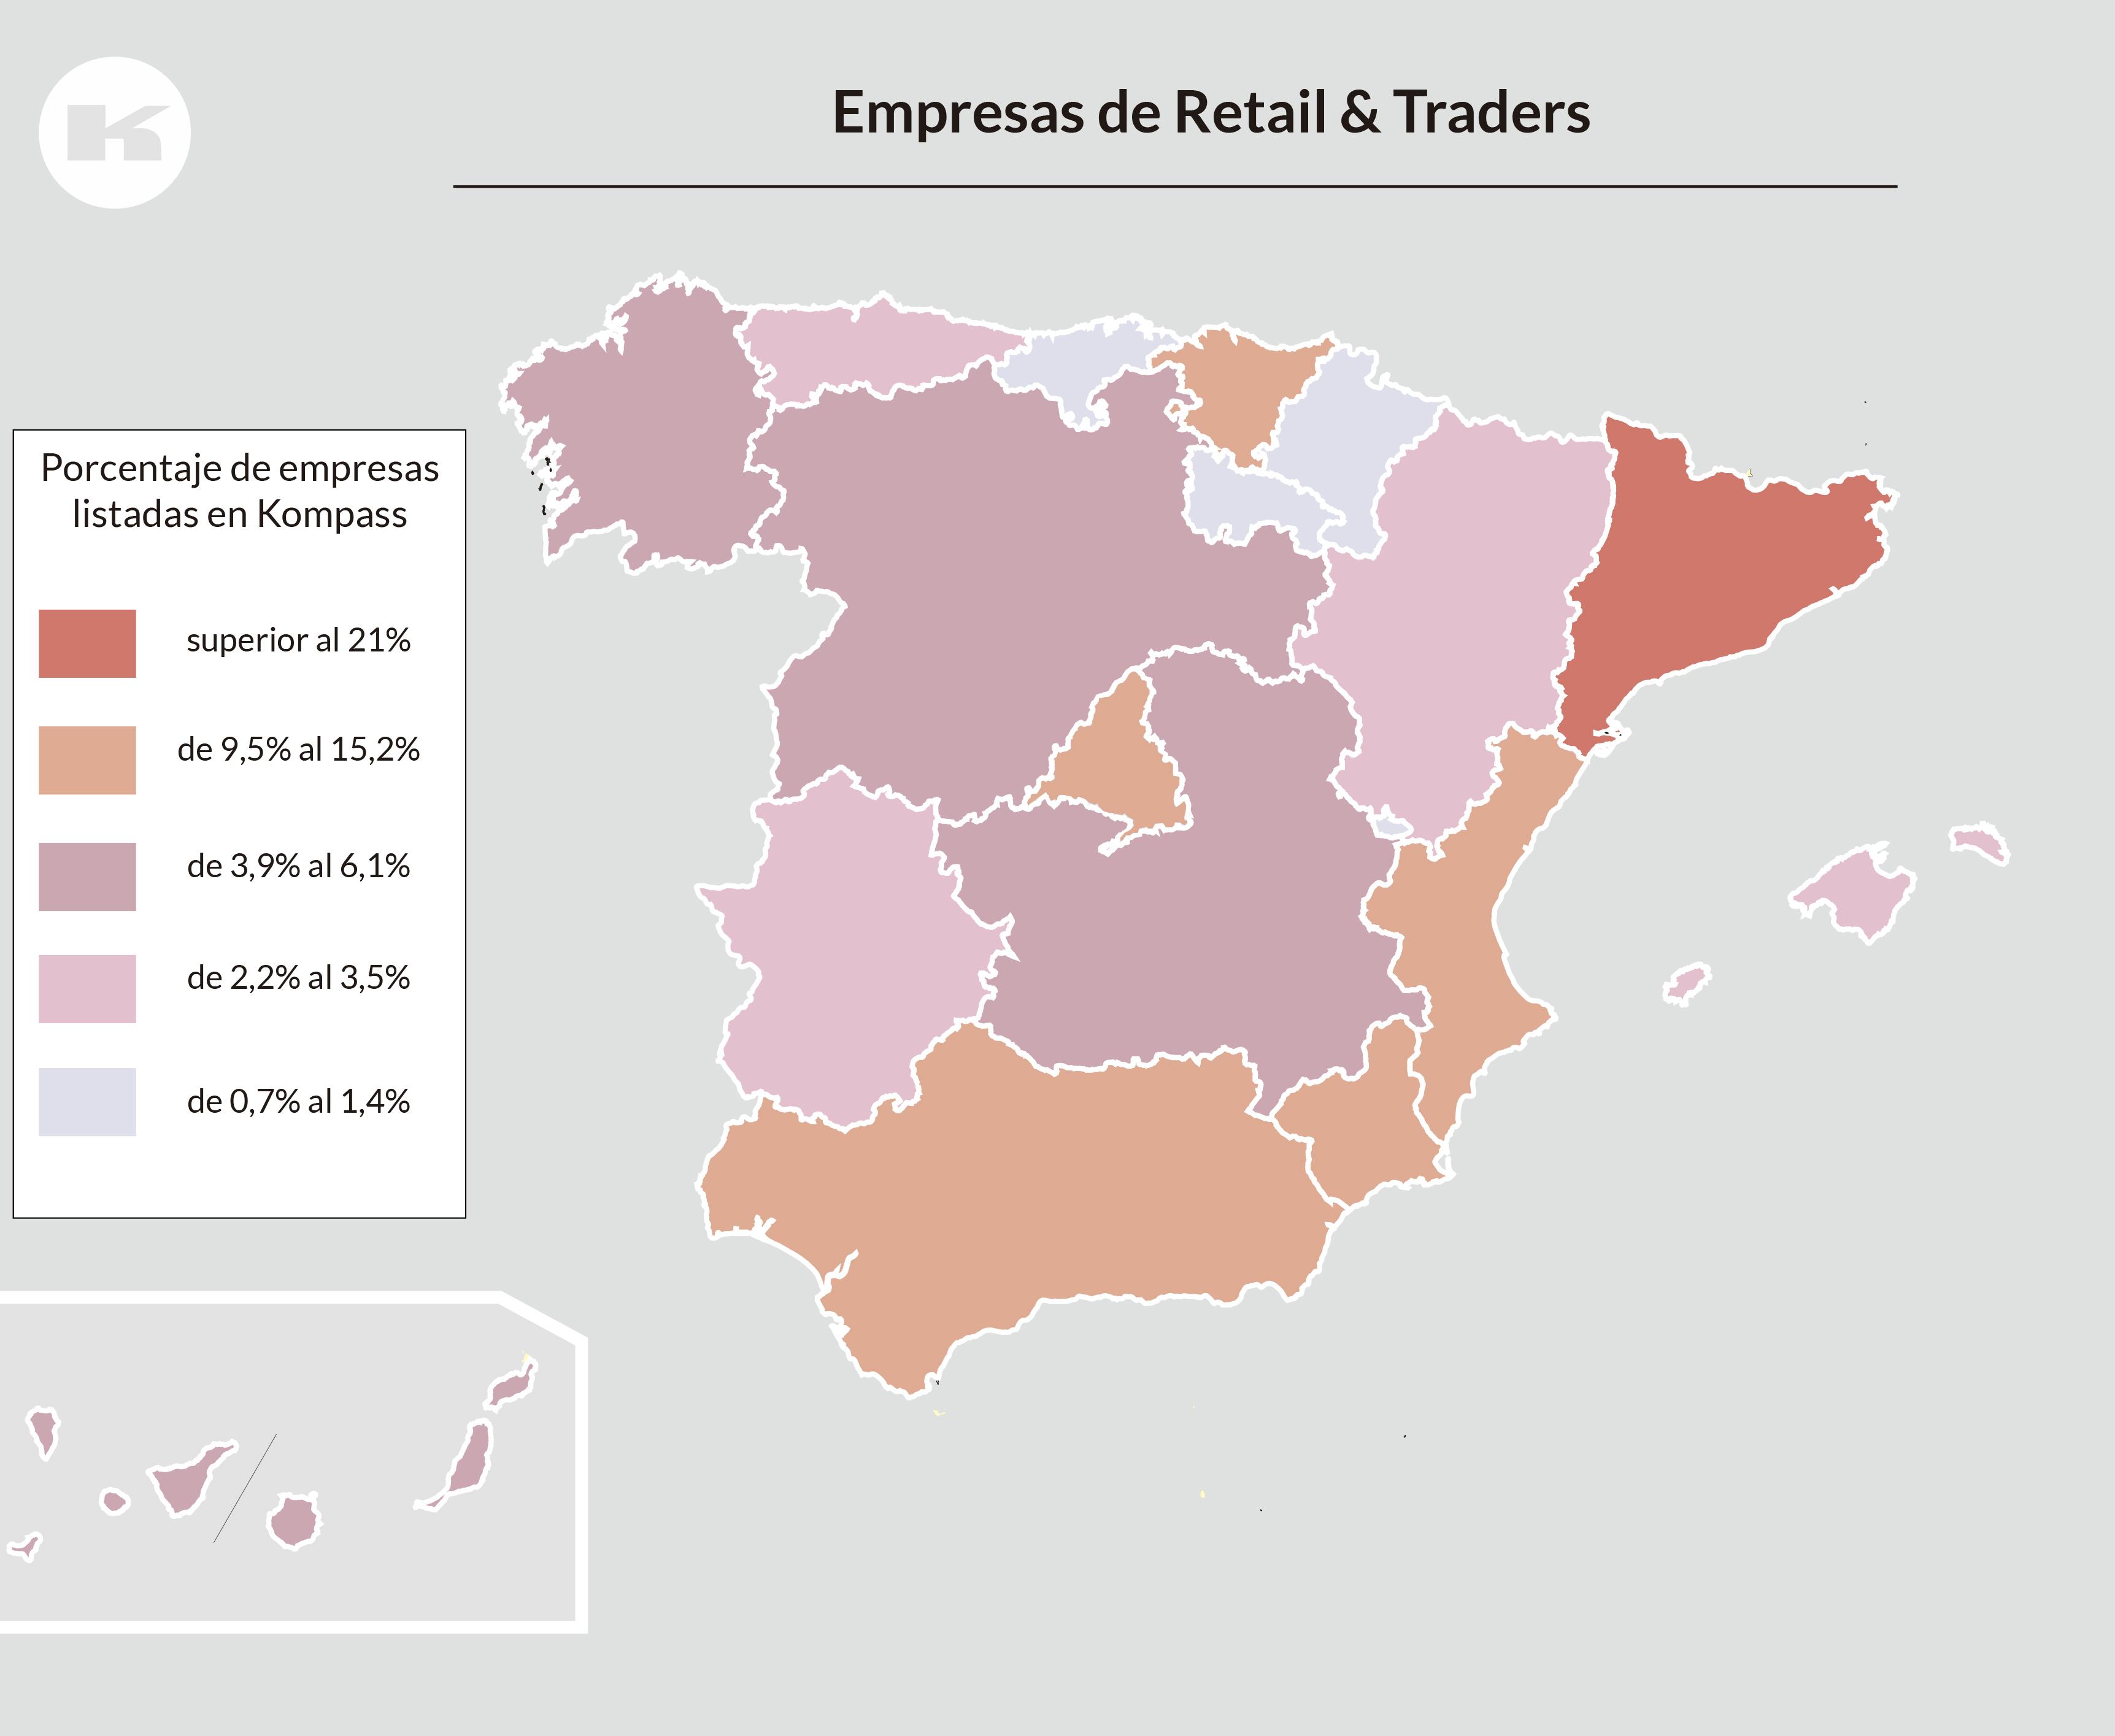 Empresas Retail & Traders España